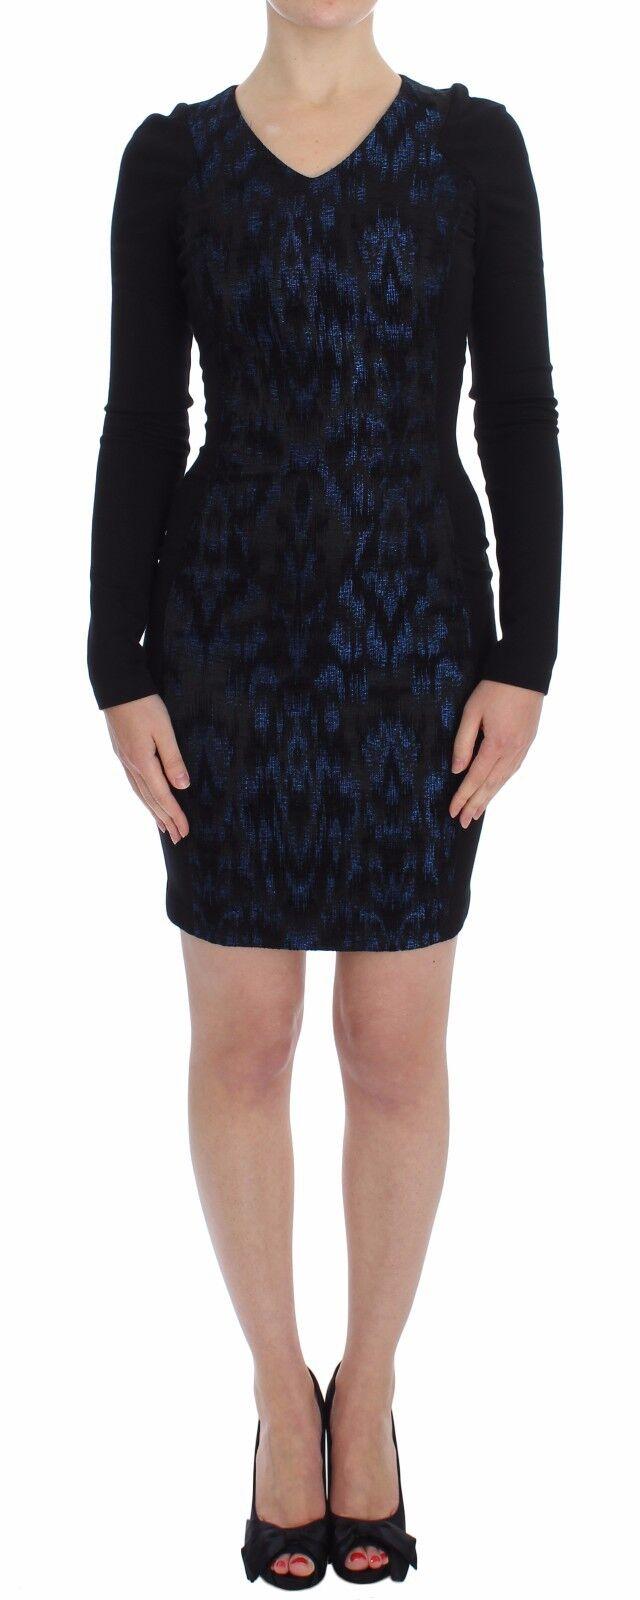 NWT VERSACE JEANS COUTURE VJC Blau schwarz Sleeve Mini Sheath Dress IT36   XS